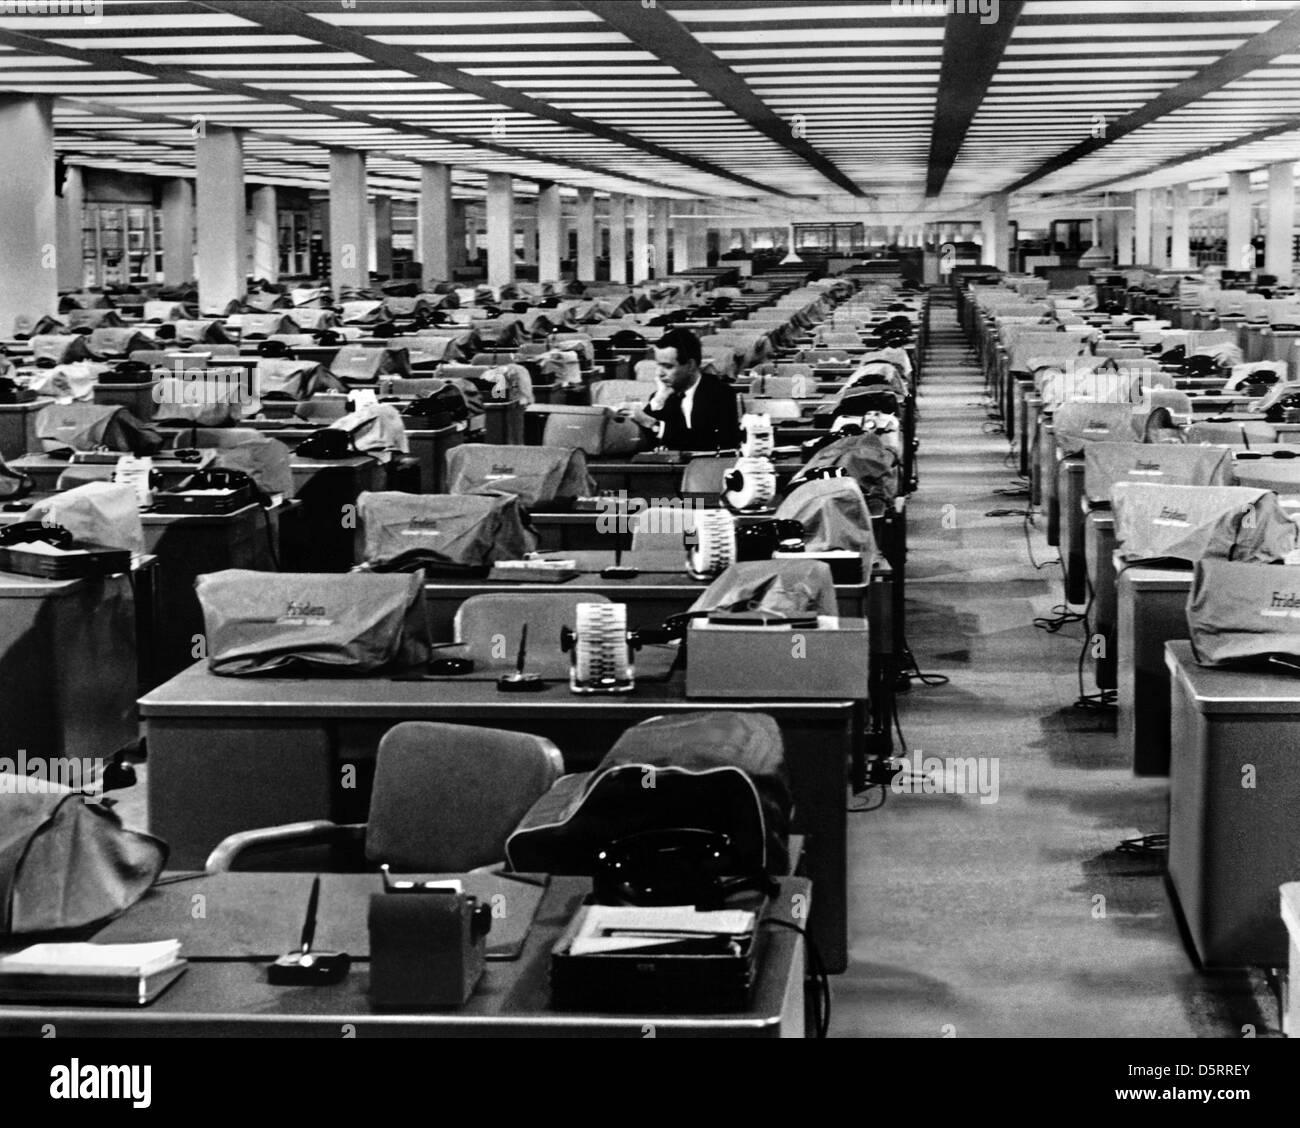 Apartment Film: JACK LEMMON THE APARTMENT (1960 Stock Photo: 55227731